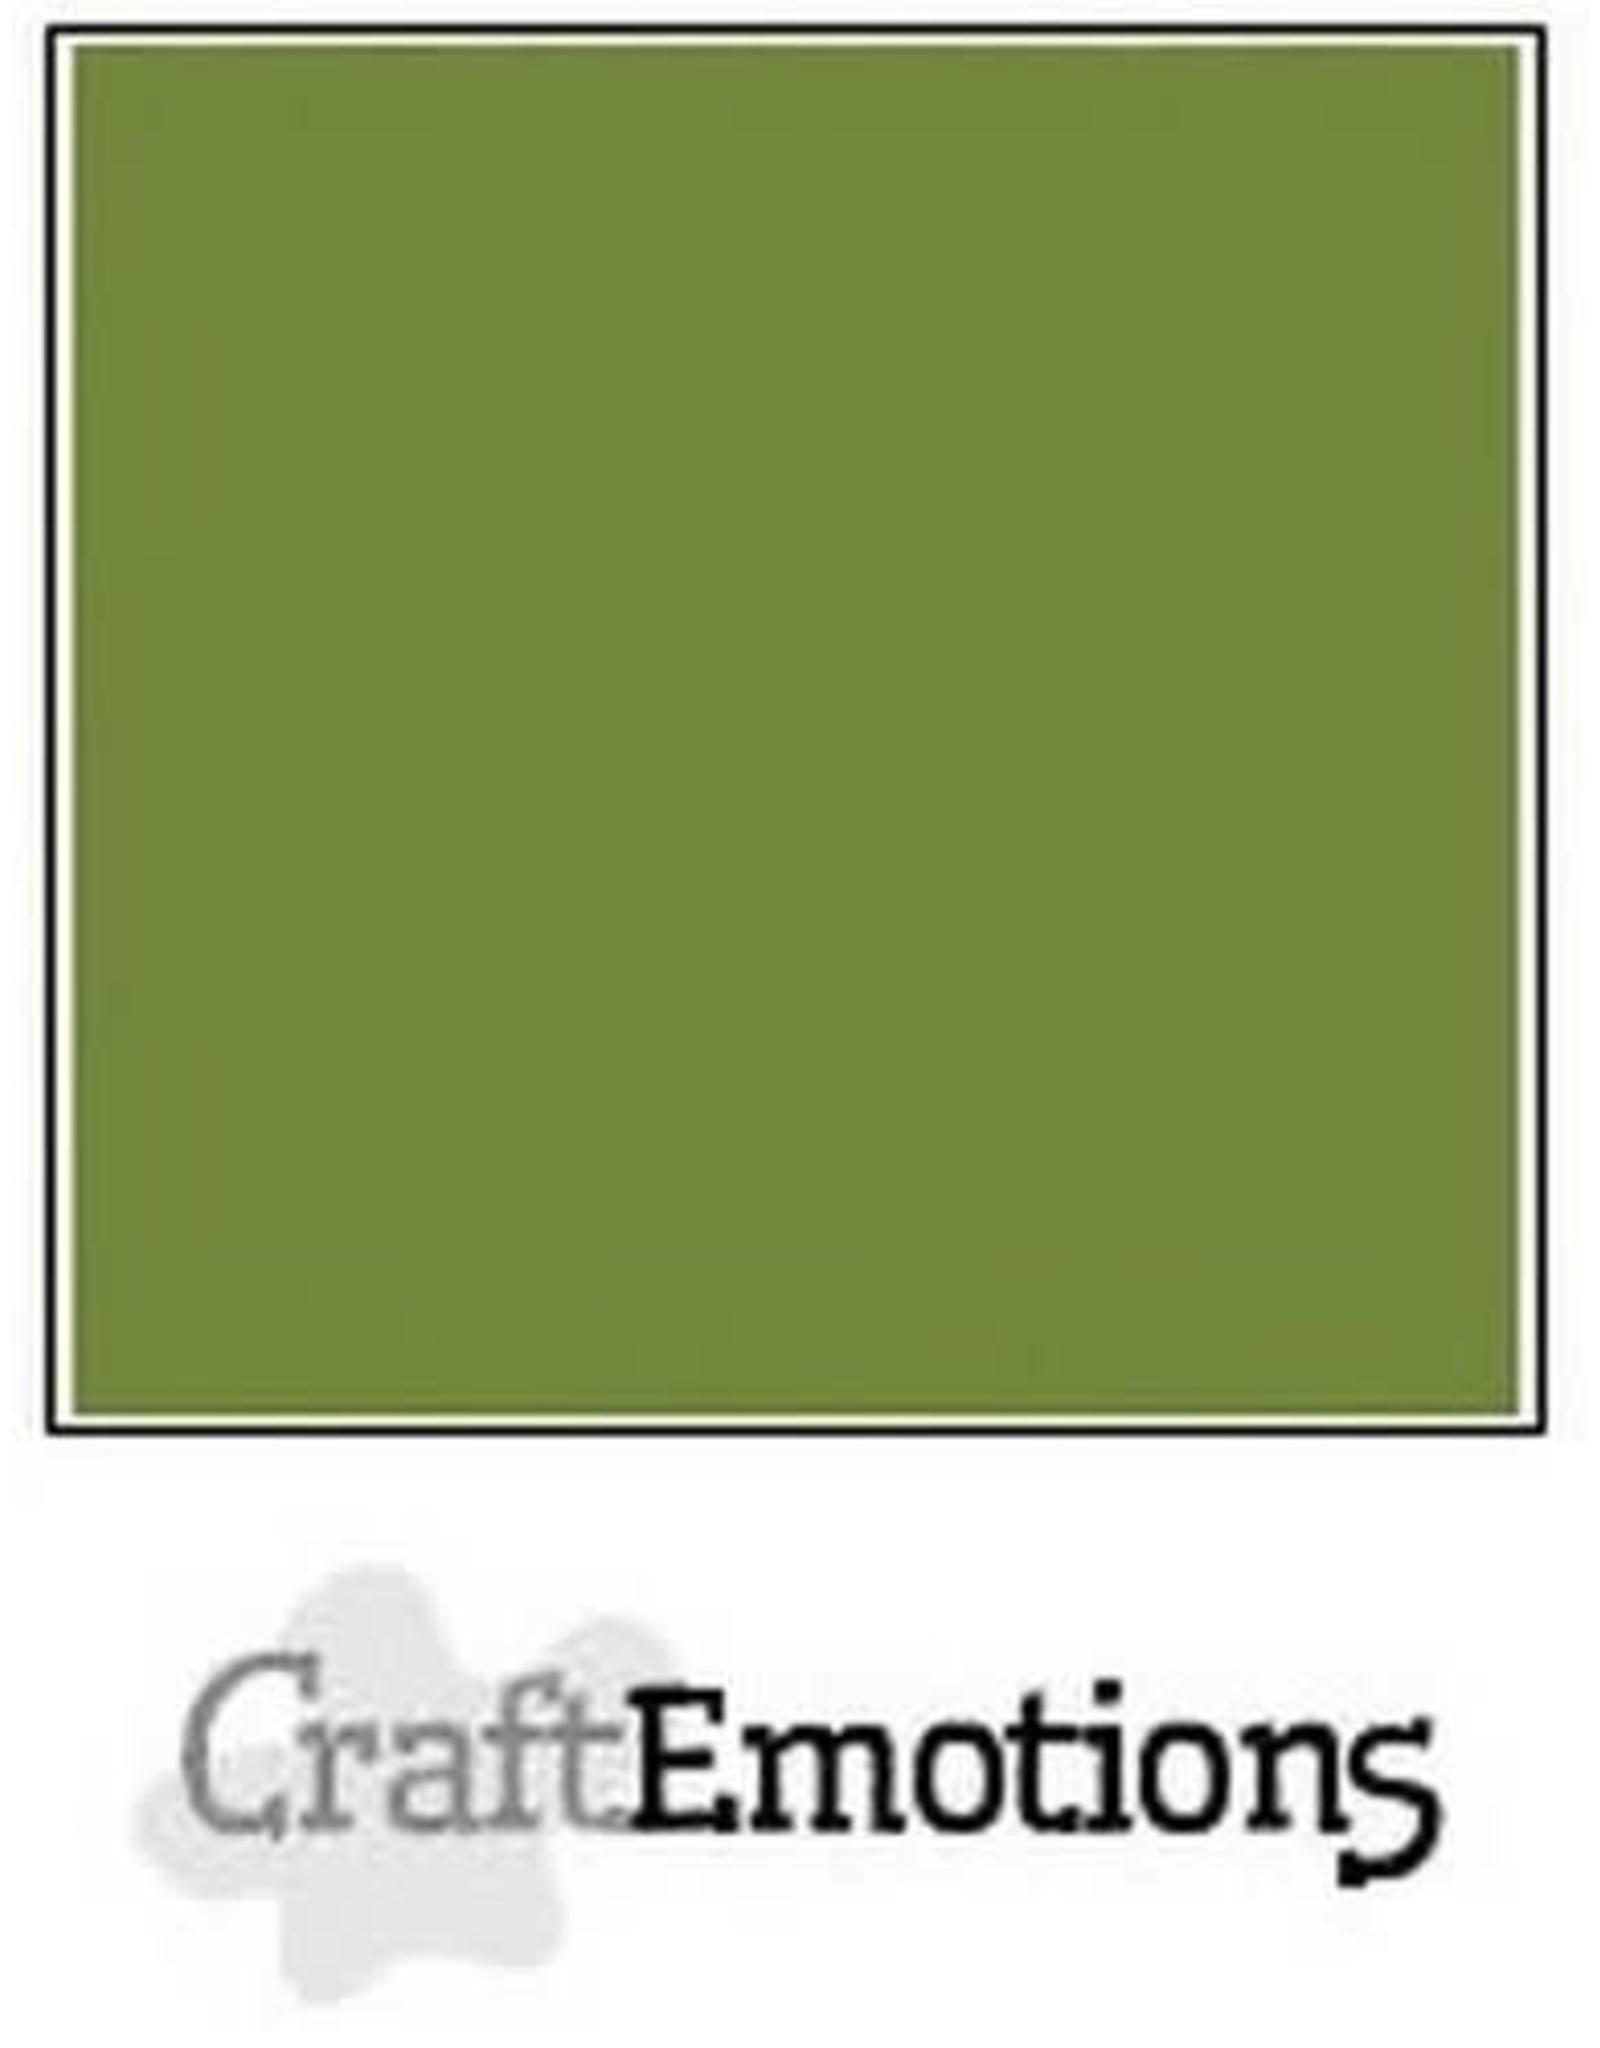 Craft Emotions CraftEmotions karton gladkarton  mosgroen 30,0x30,0cm 250gr